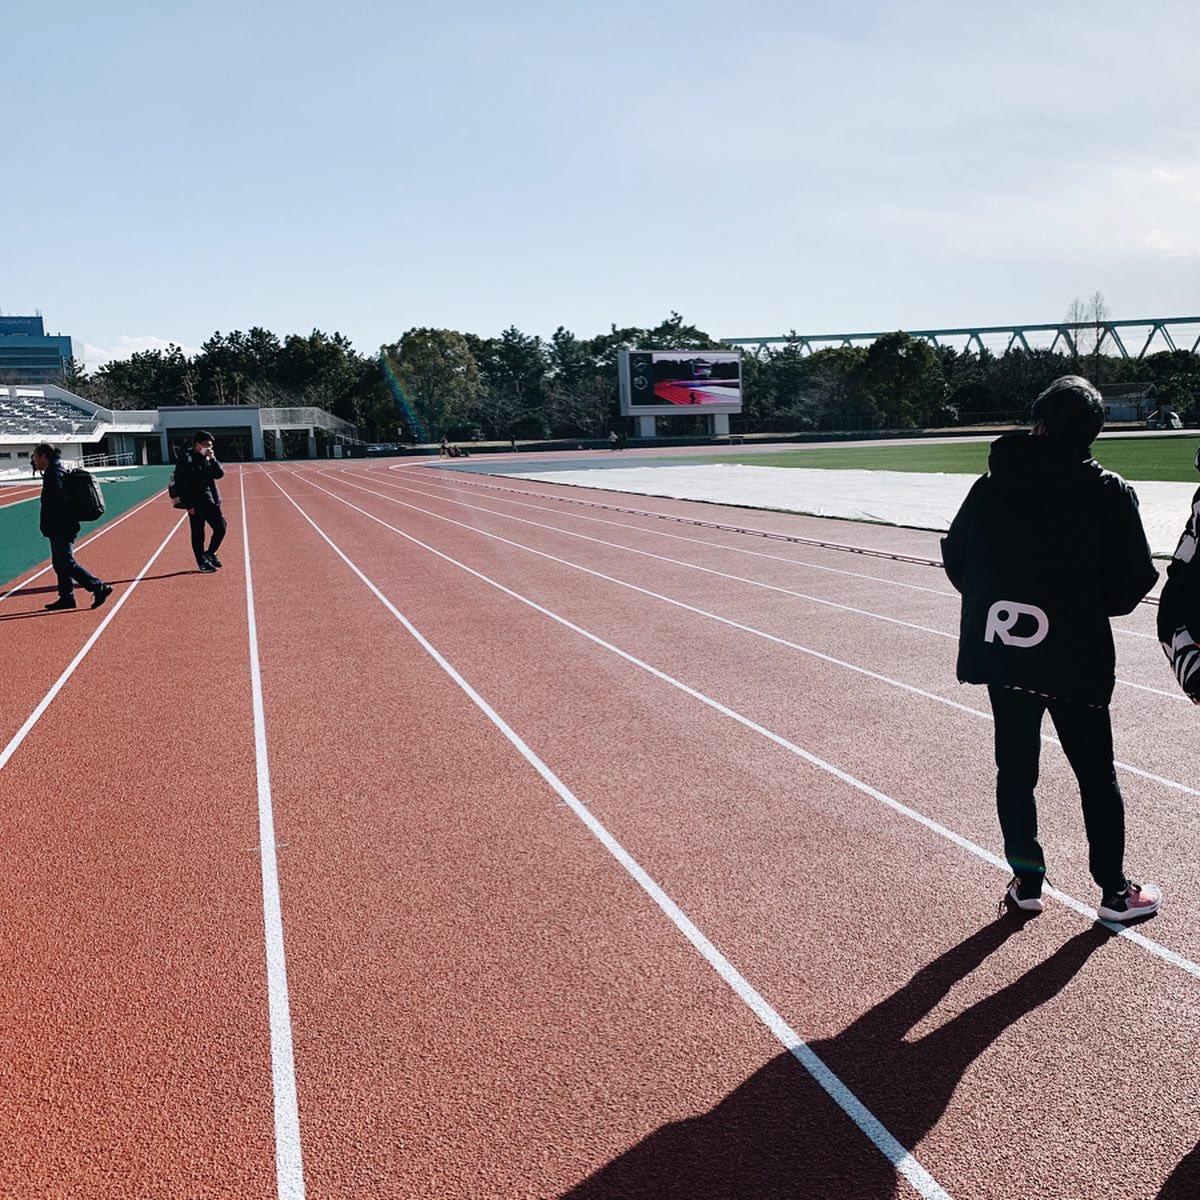 #runningday pic.twitter.com/pdwAlX9ABg